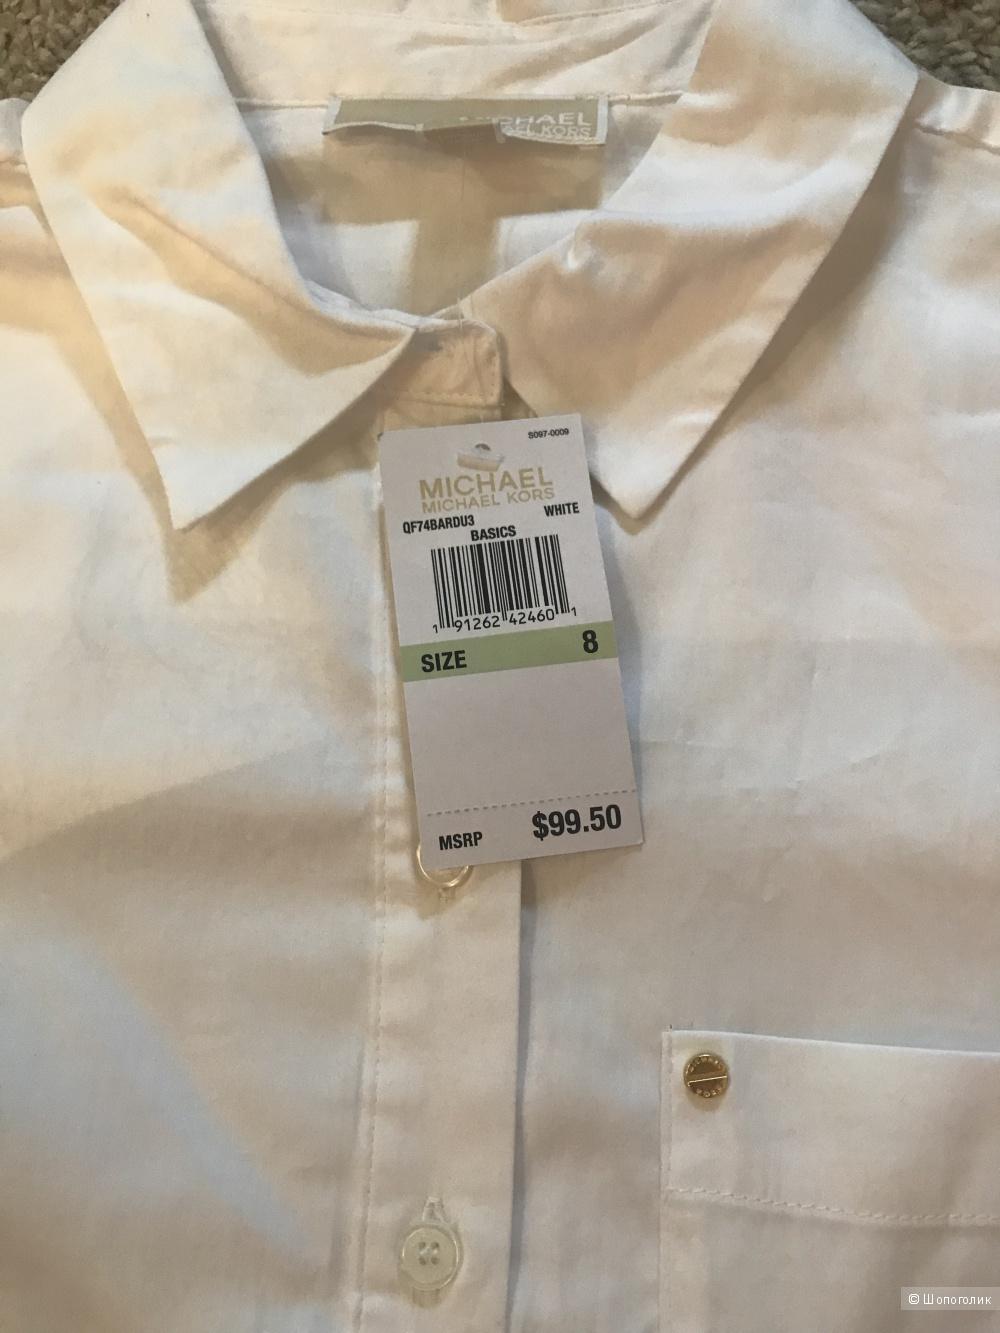 Блуза Michael Kors (Размер 8 US, росс. 42-44)